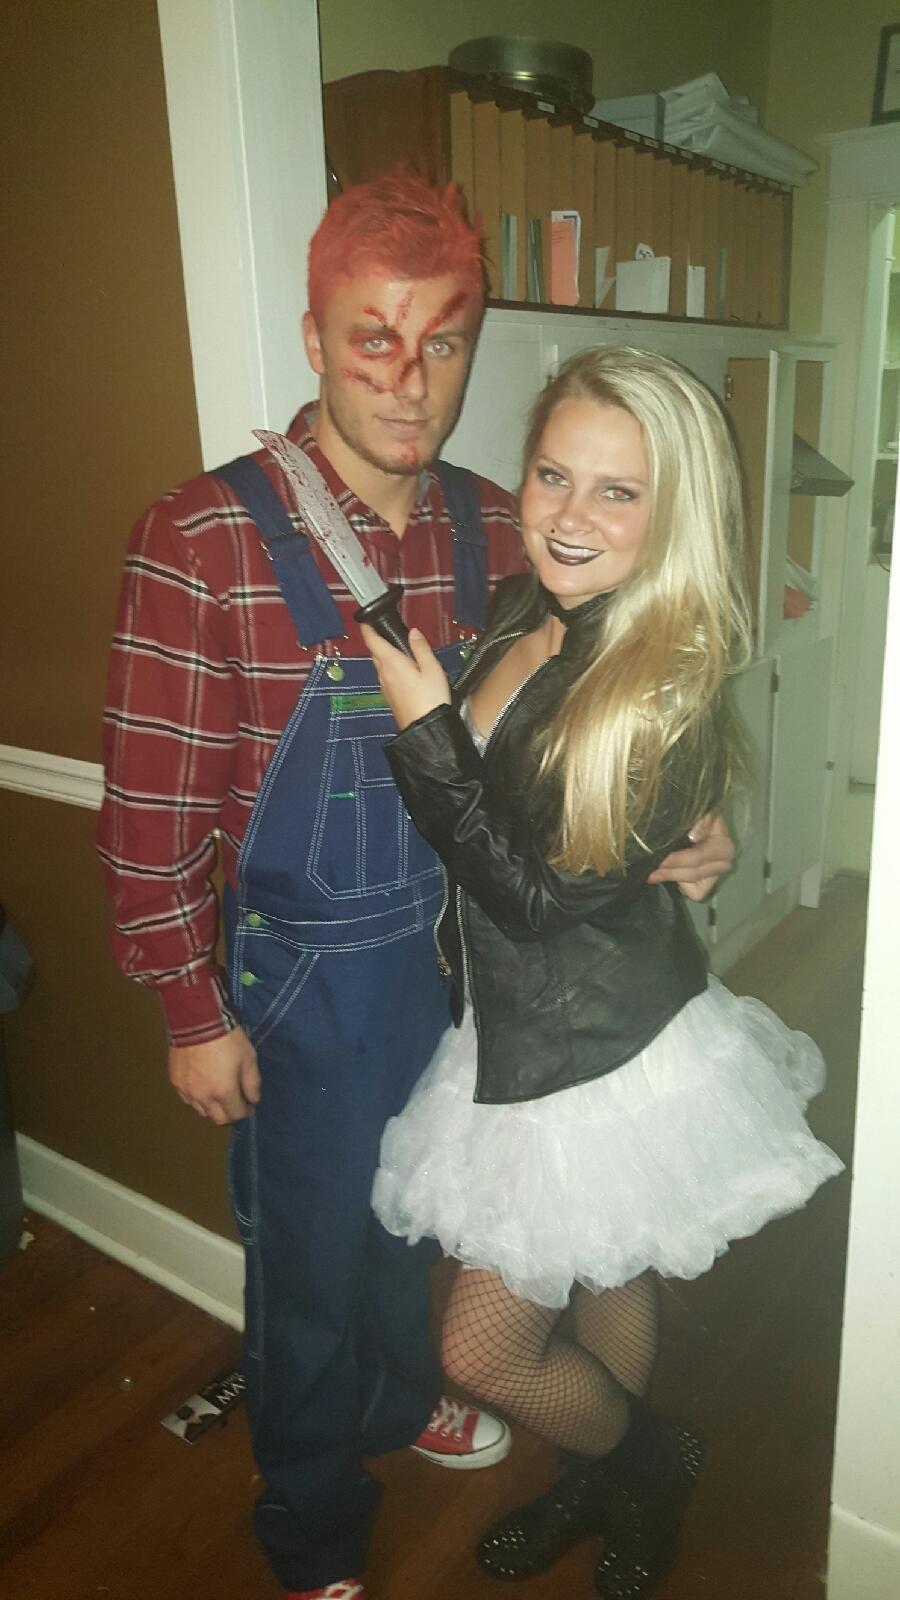 couples halloween costume chucky and bride halloween